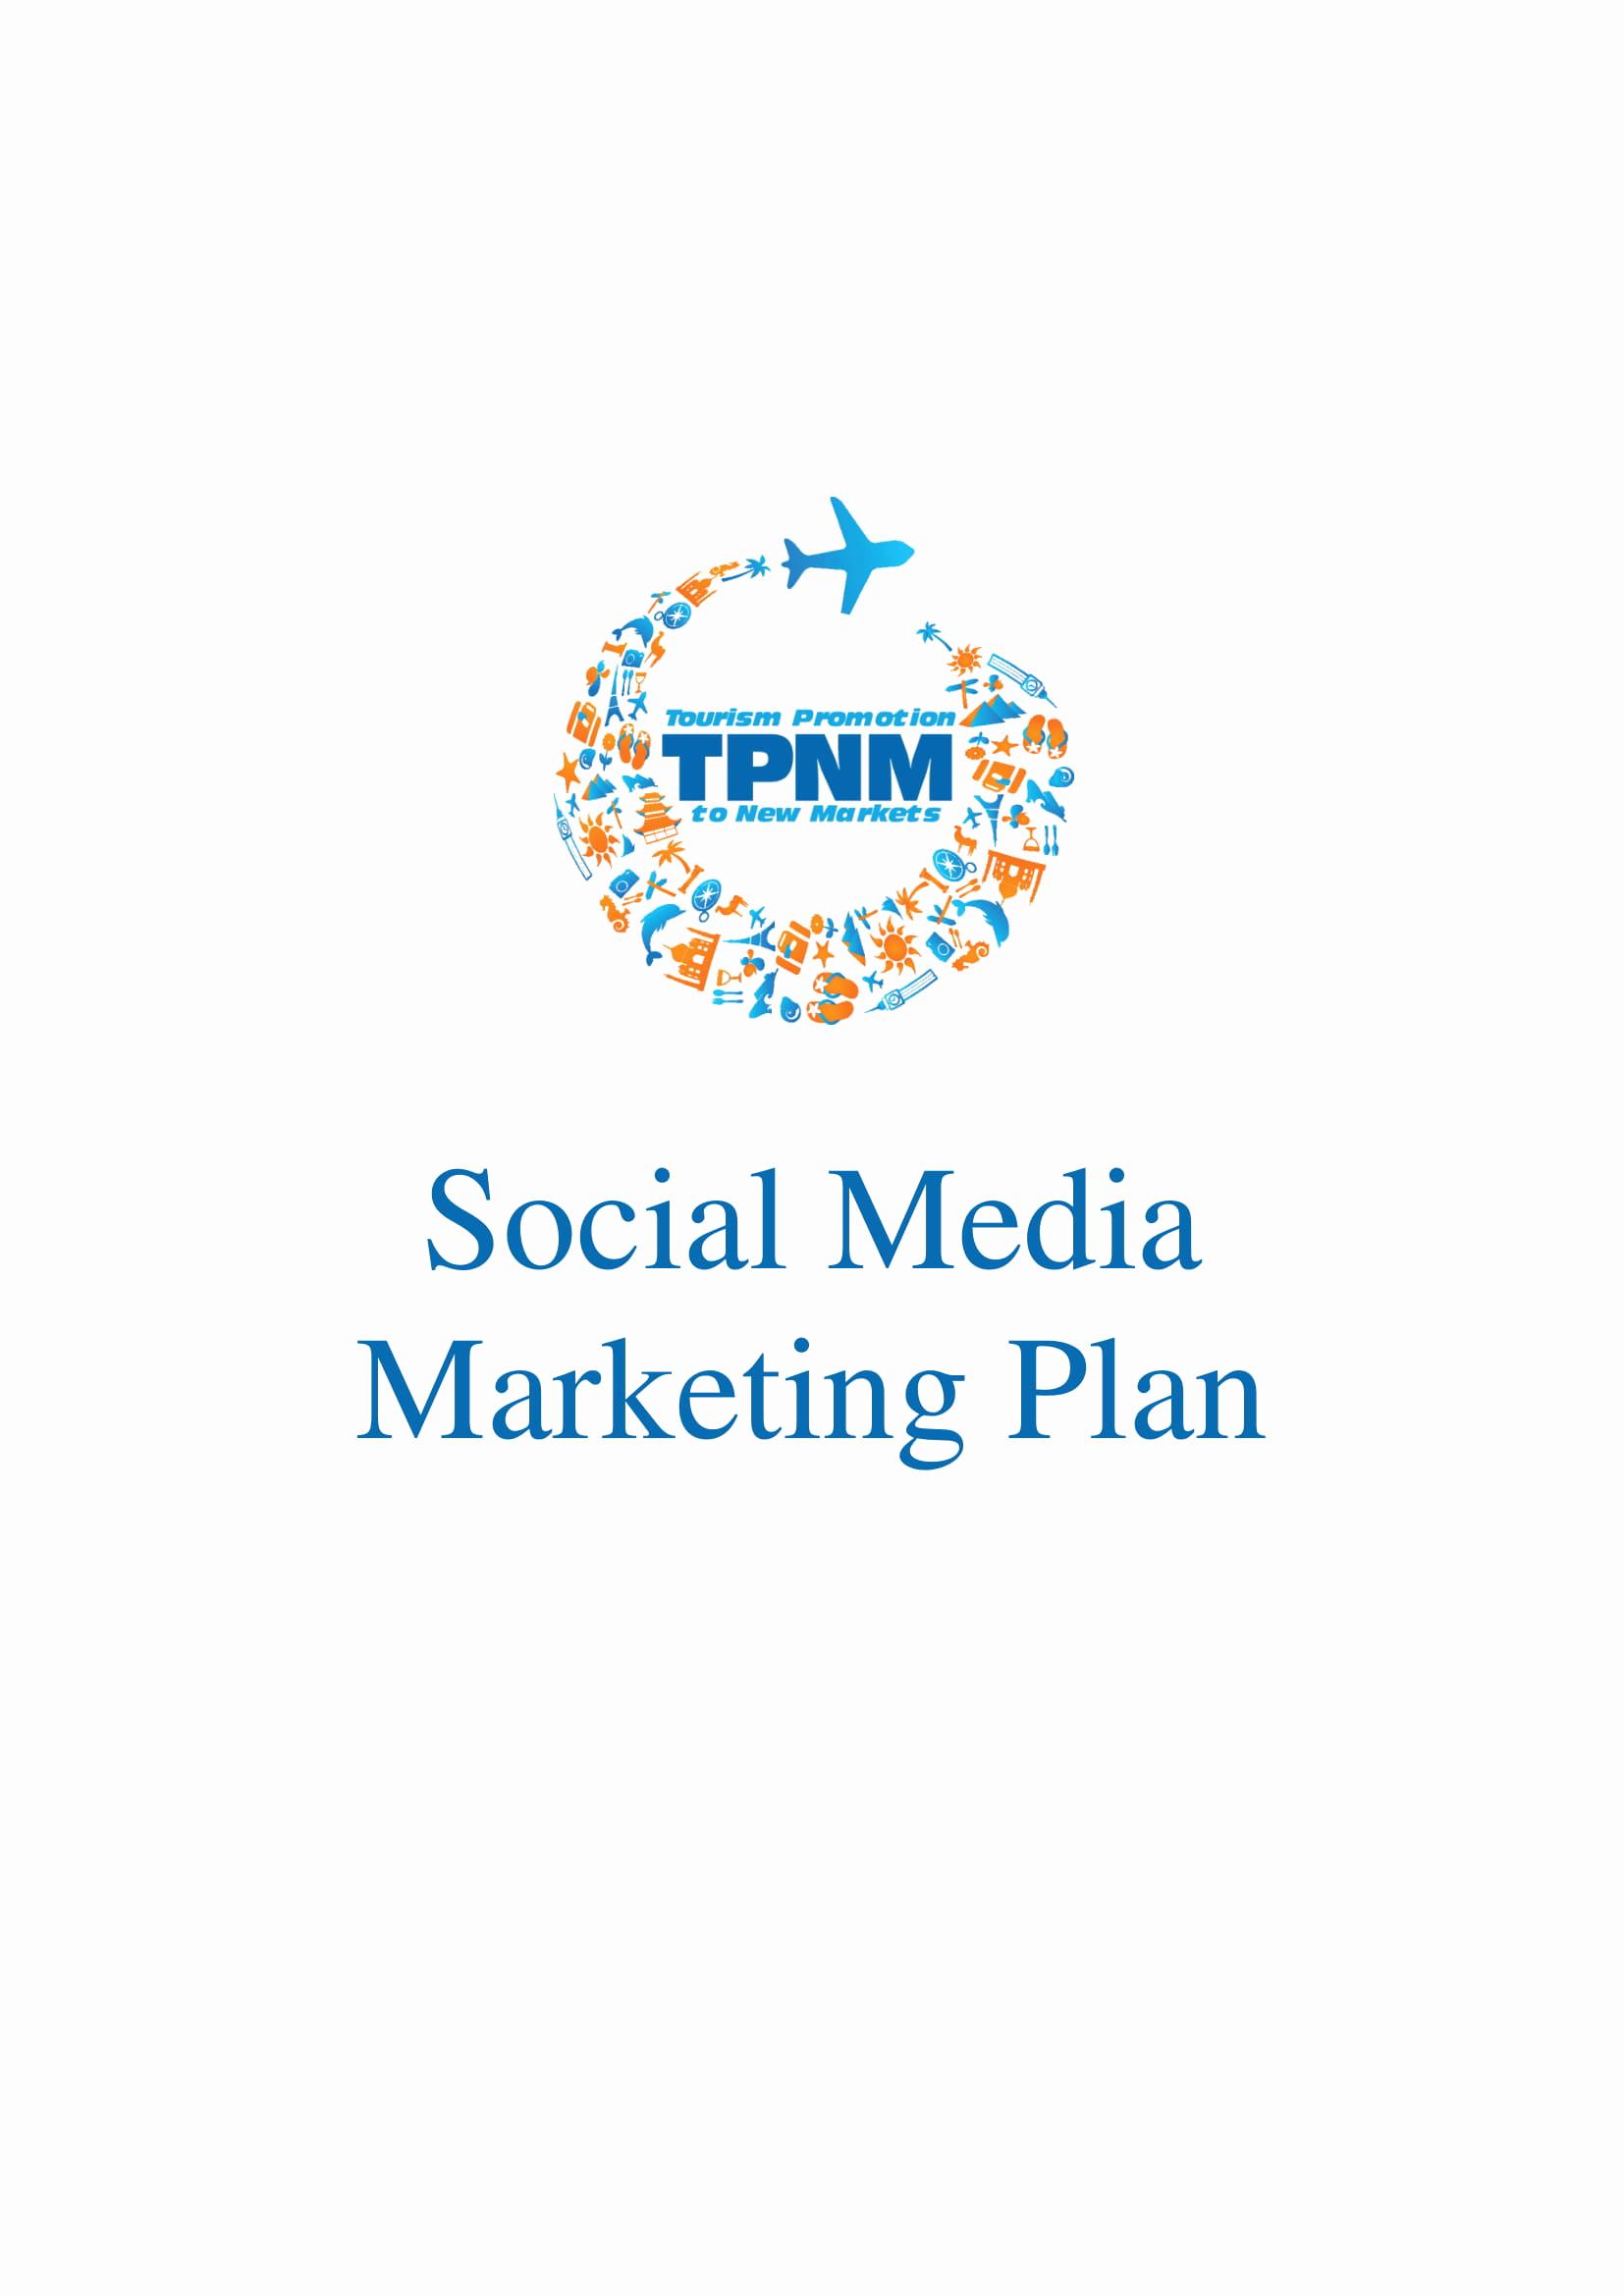 Social Media Marketing Proposal Inspirational 12 Restaurant social Media Marketing Proposal Examples